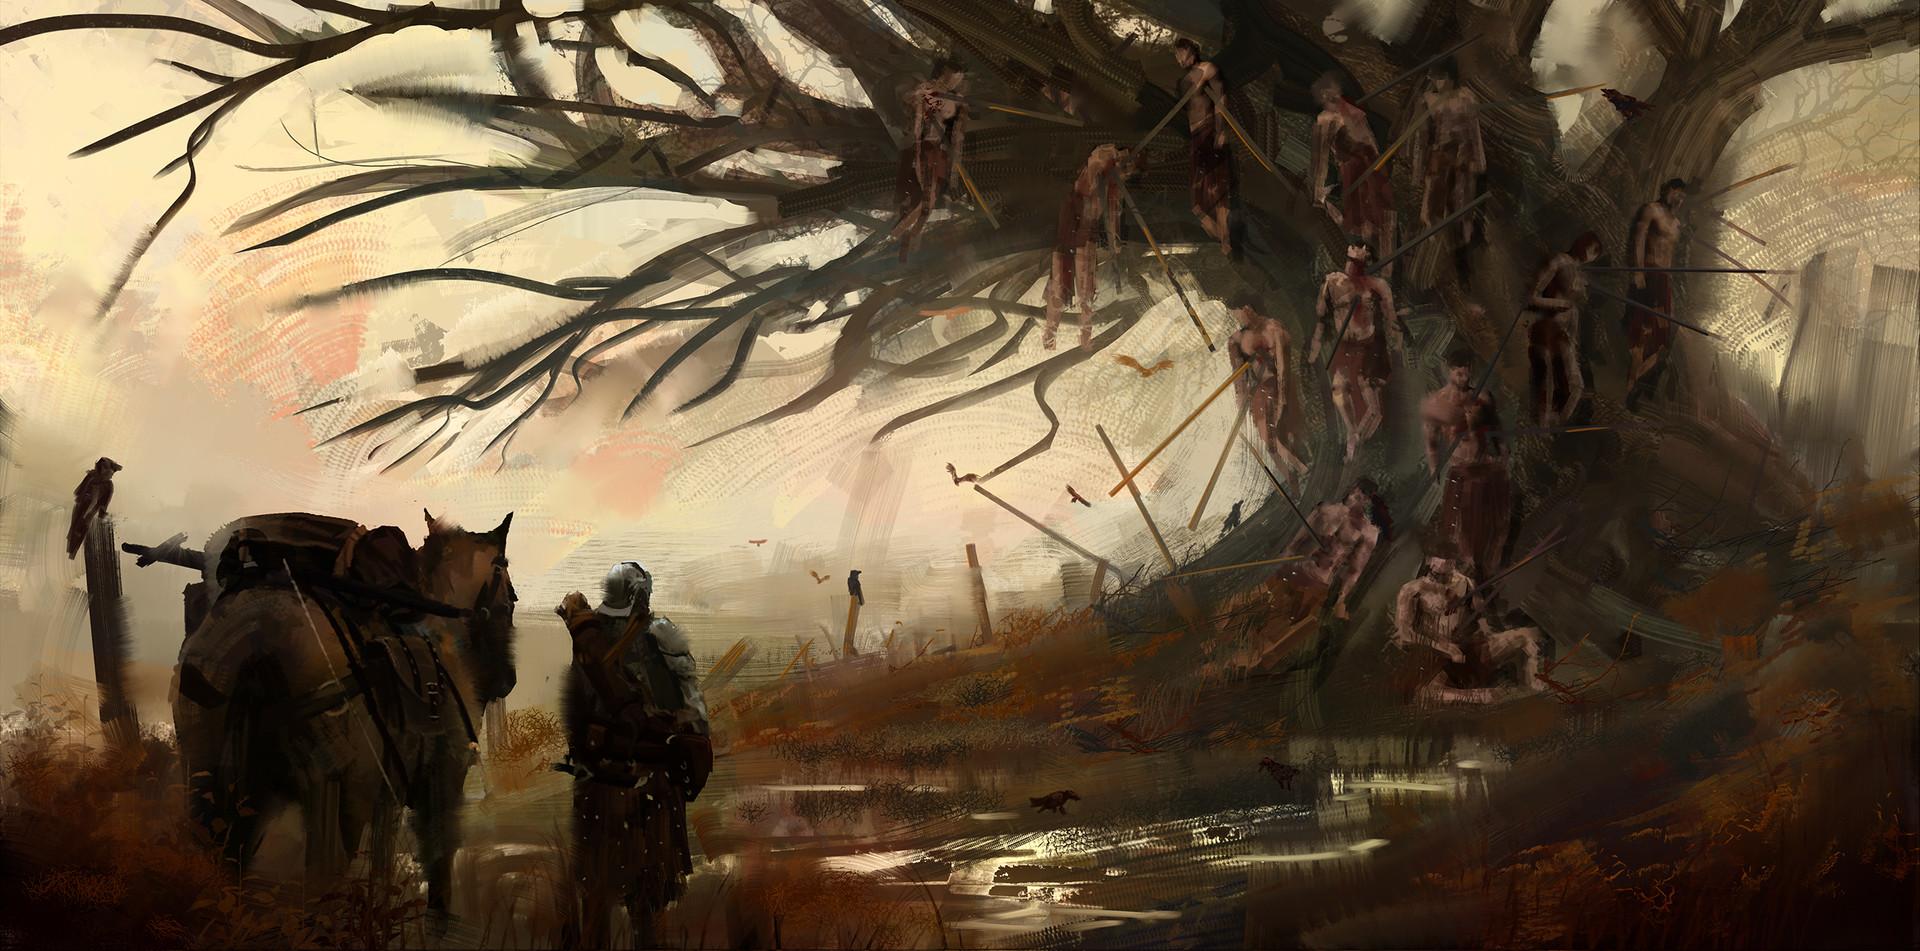 Jack dowell deadtreesml